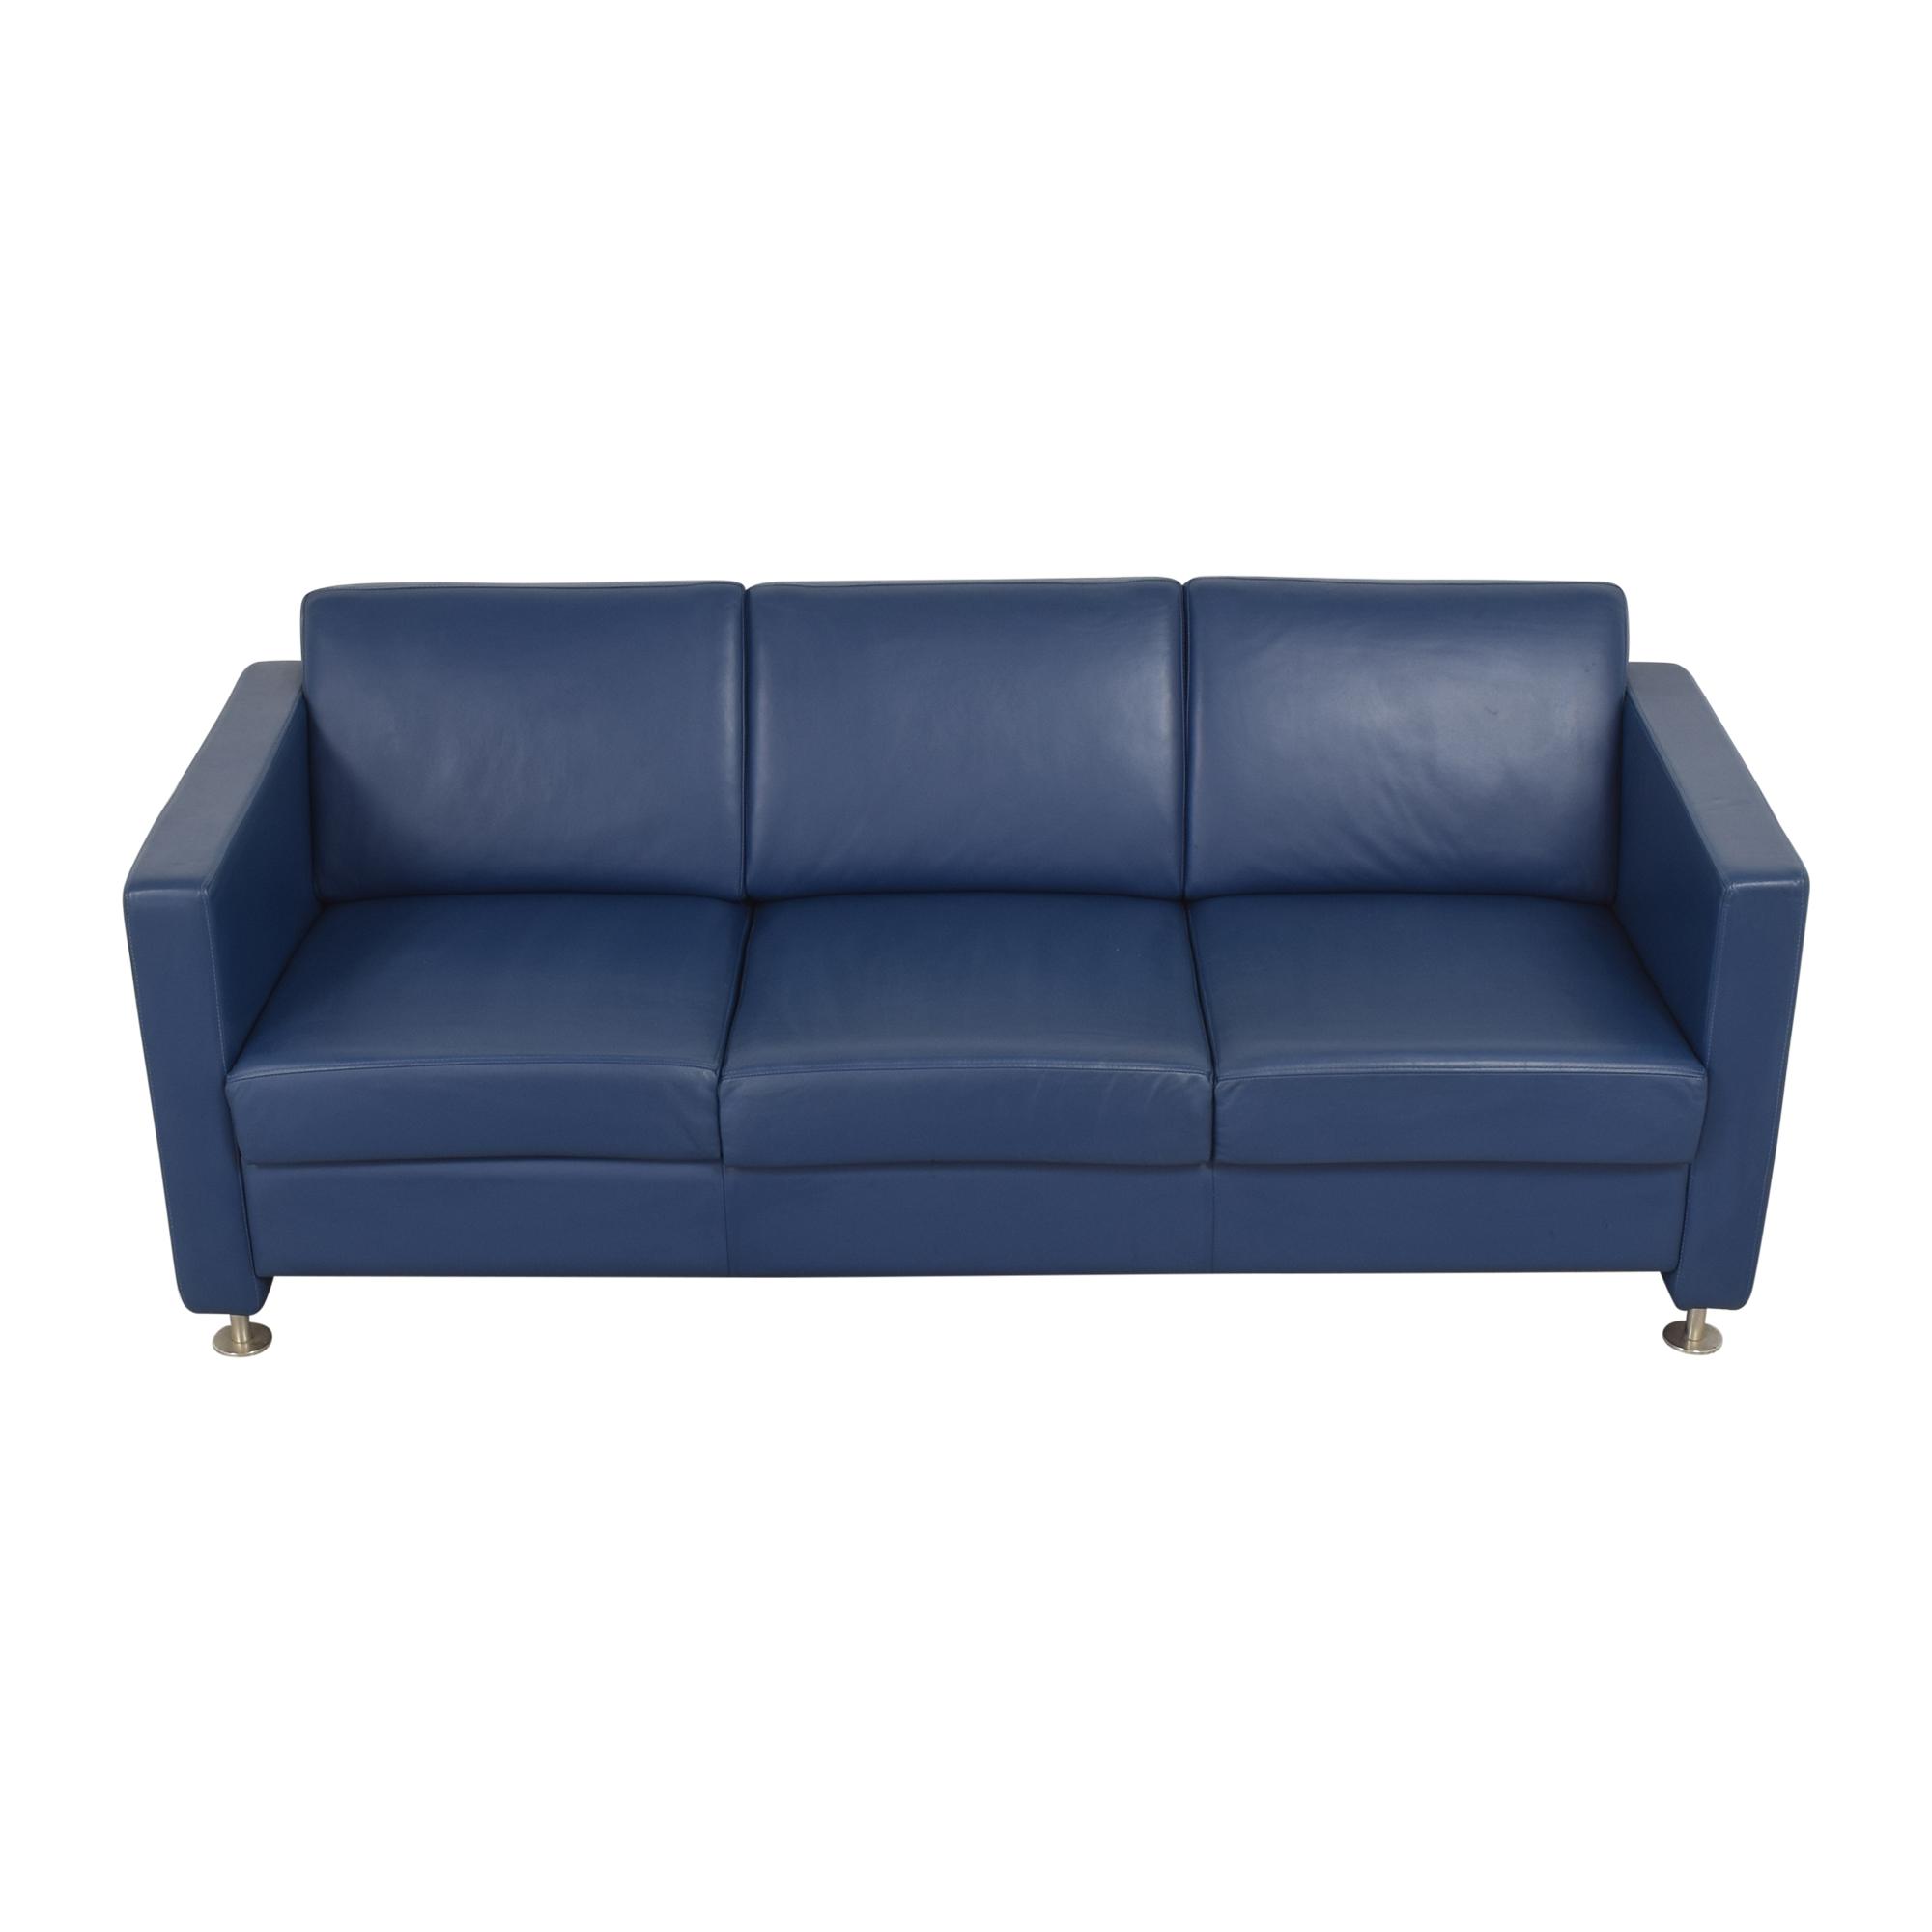 buy Krug Sloane Sofa Krug Classic Sofas